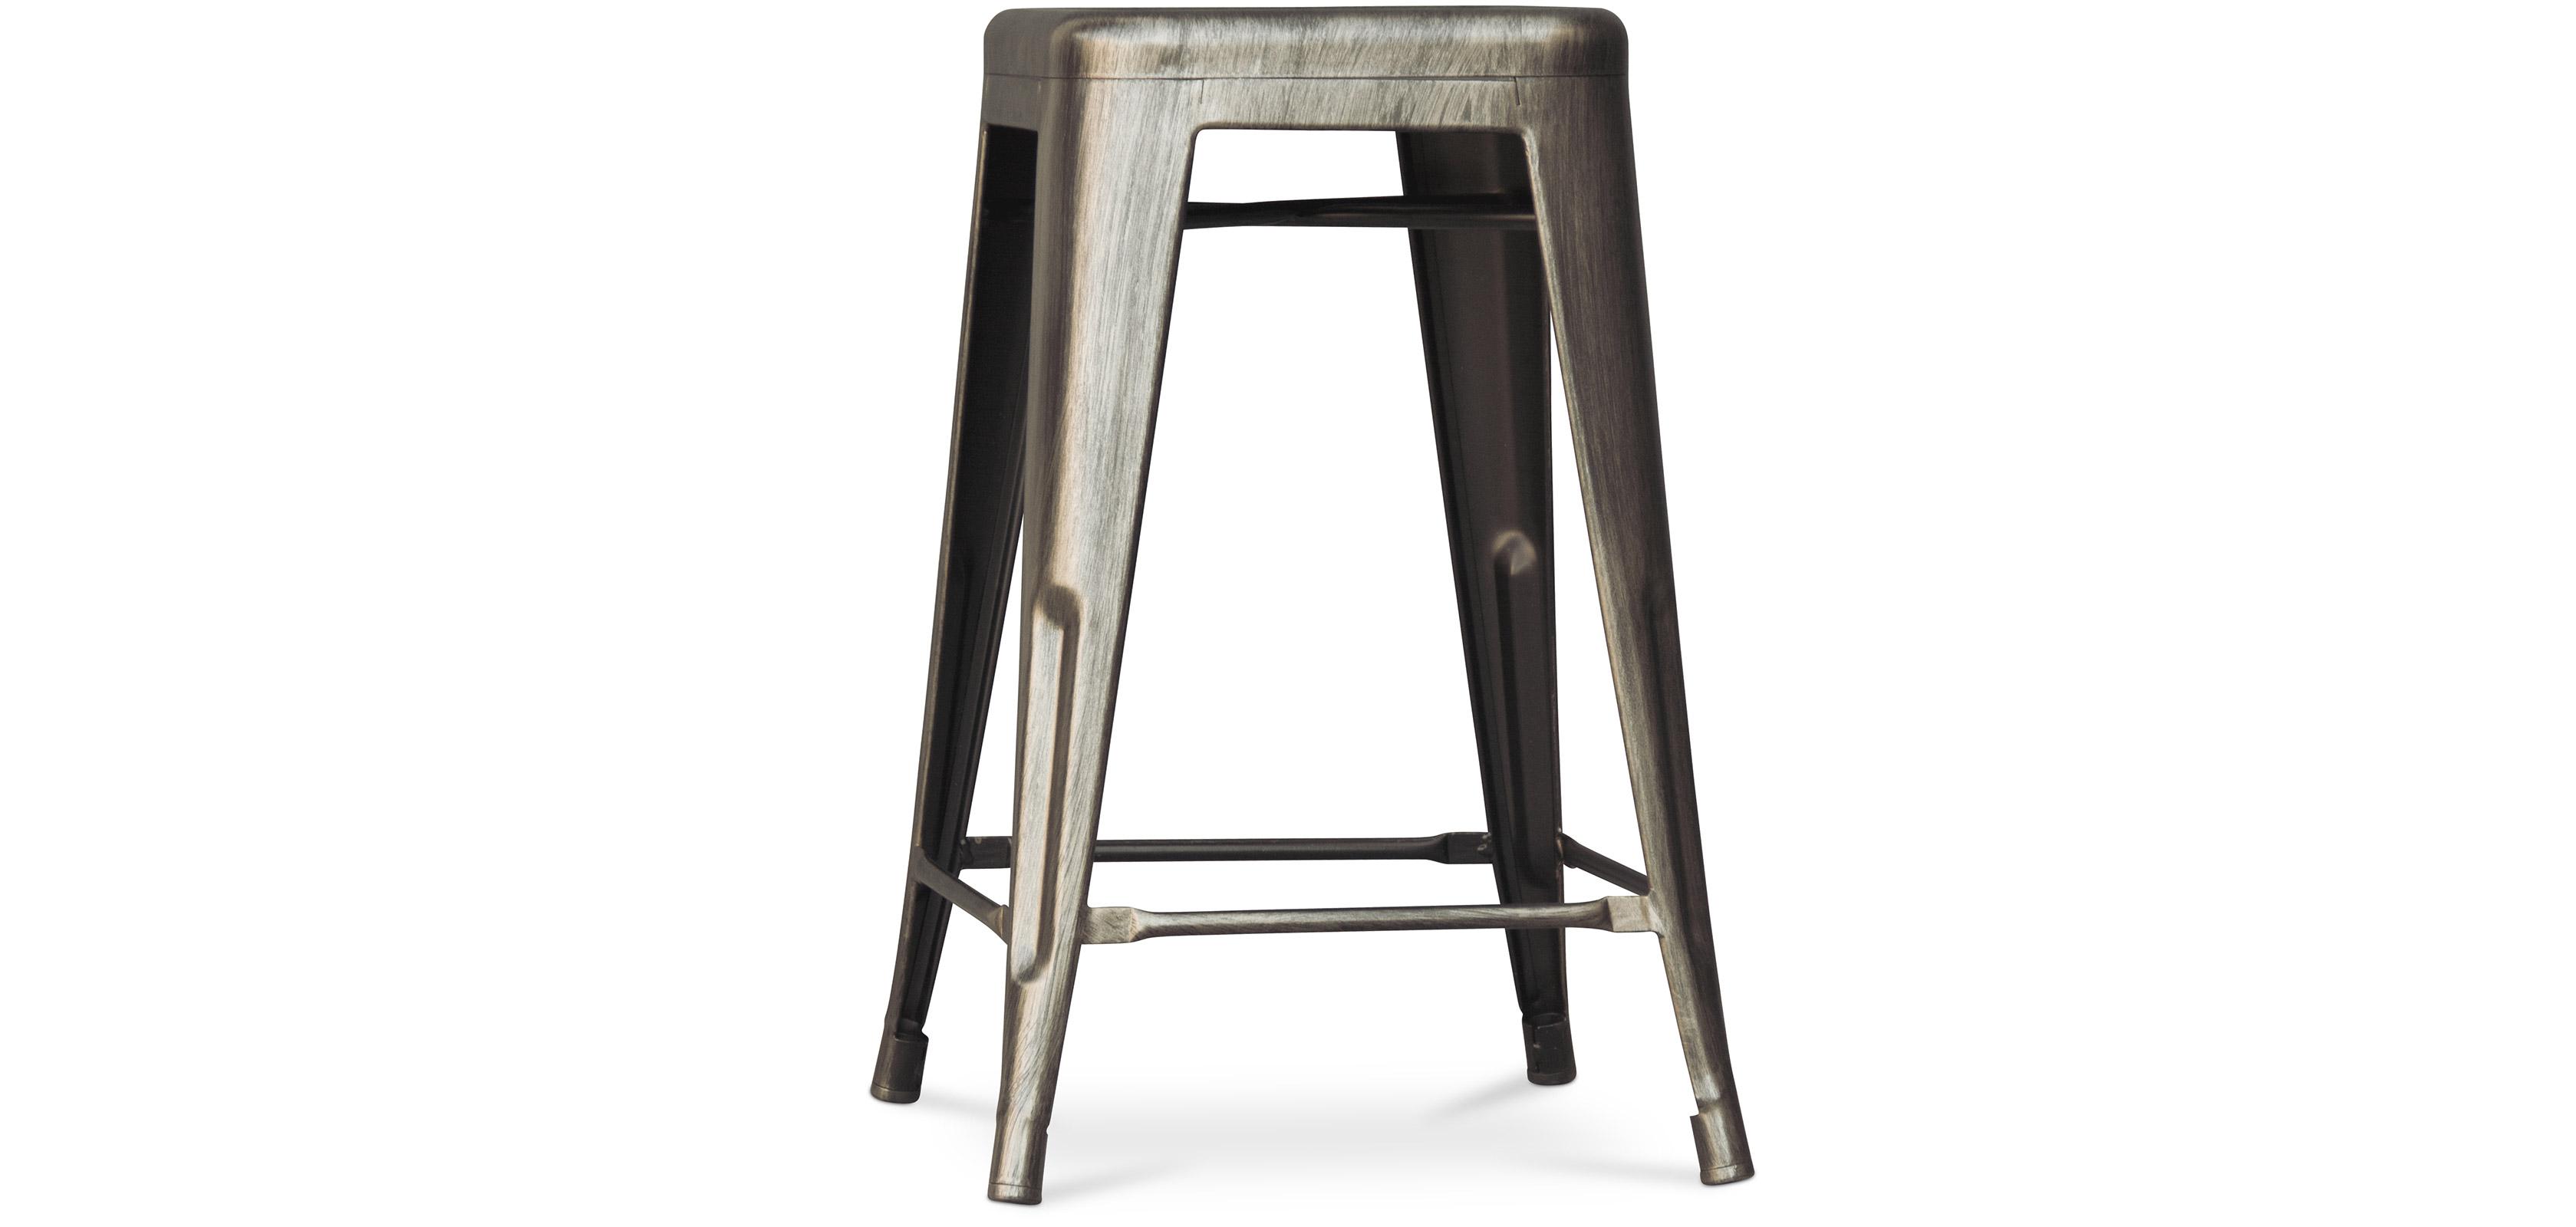 tabouret tolix xavier pauchard. Black Bedroom Furniture Sets. Home Design Ideas